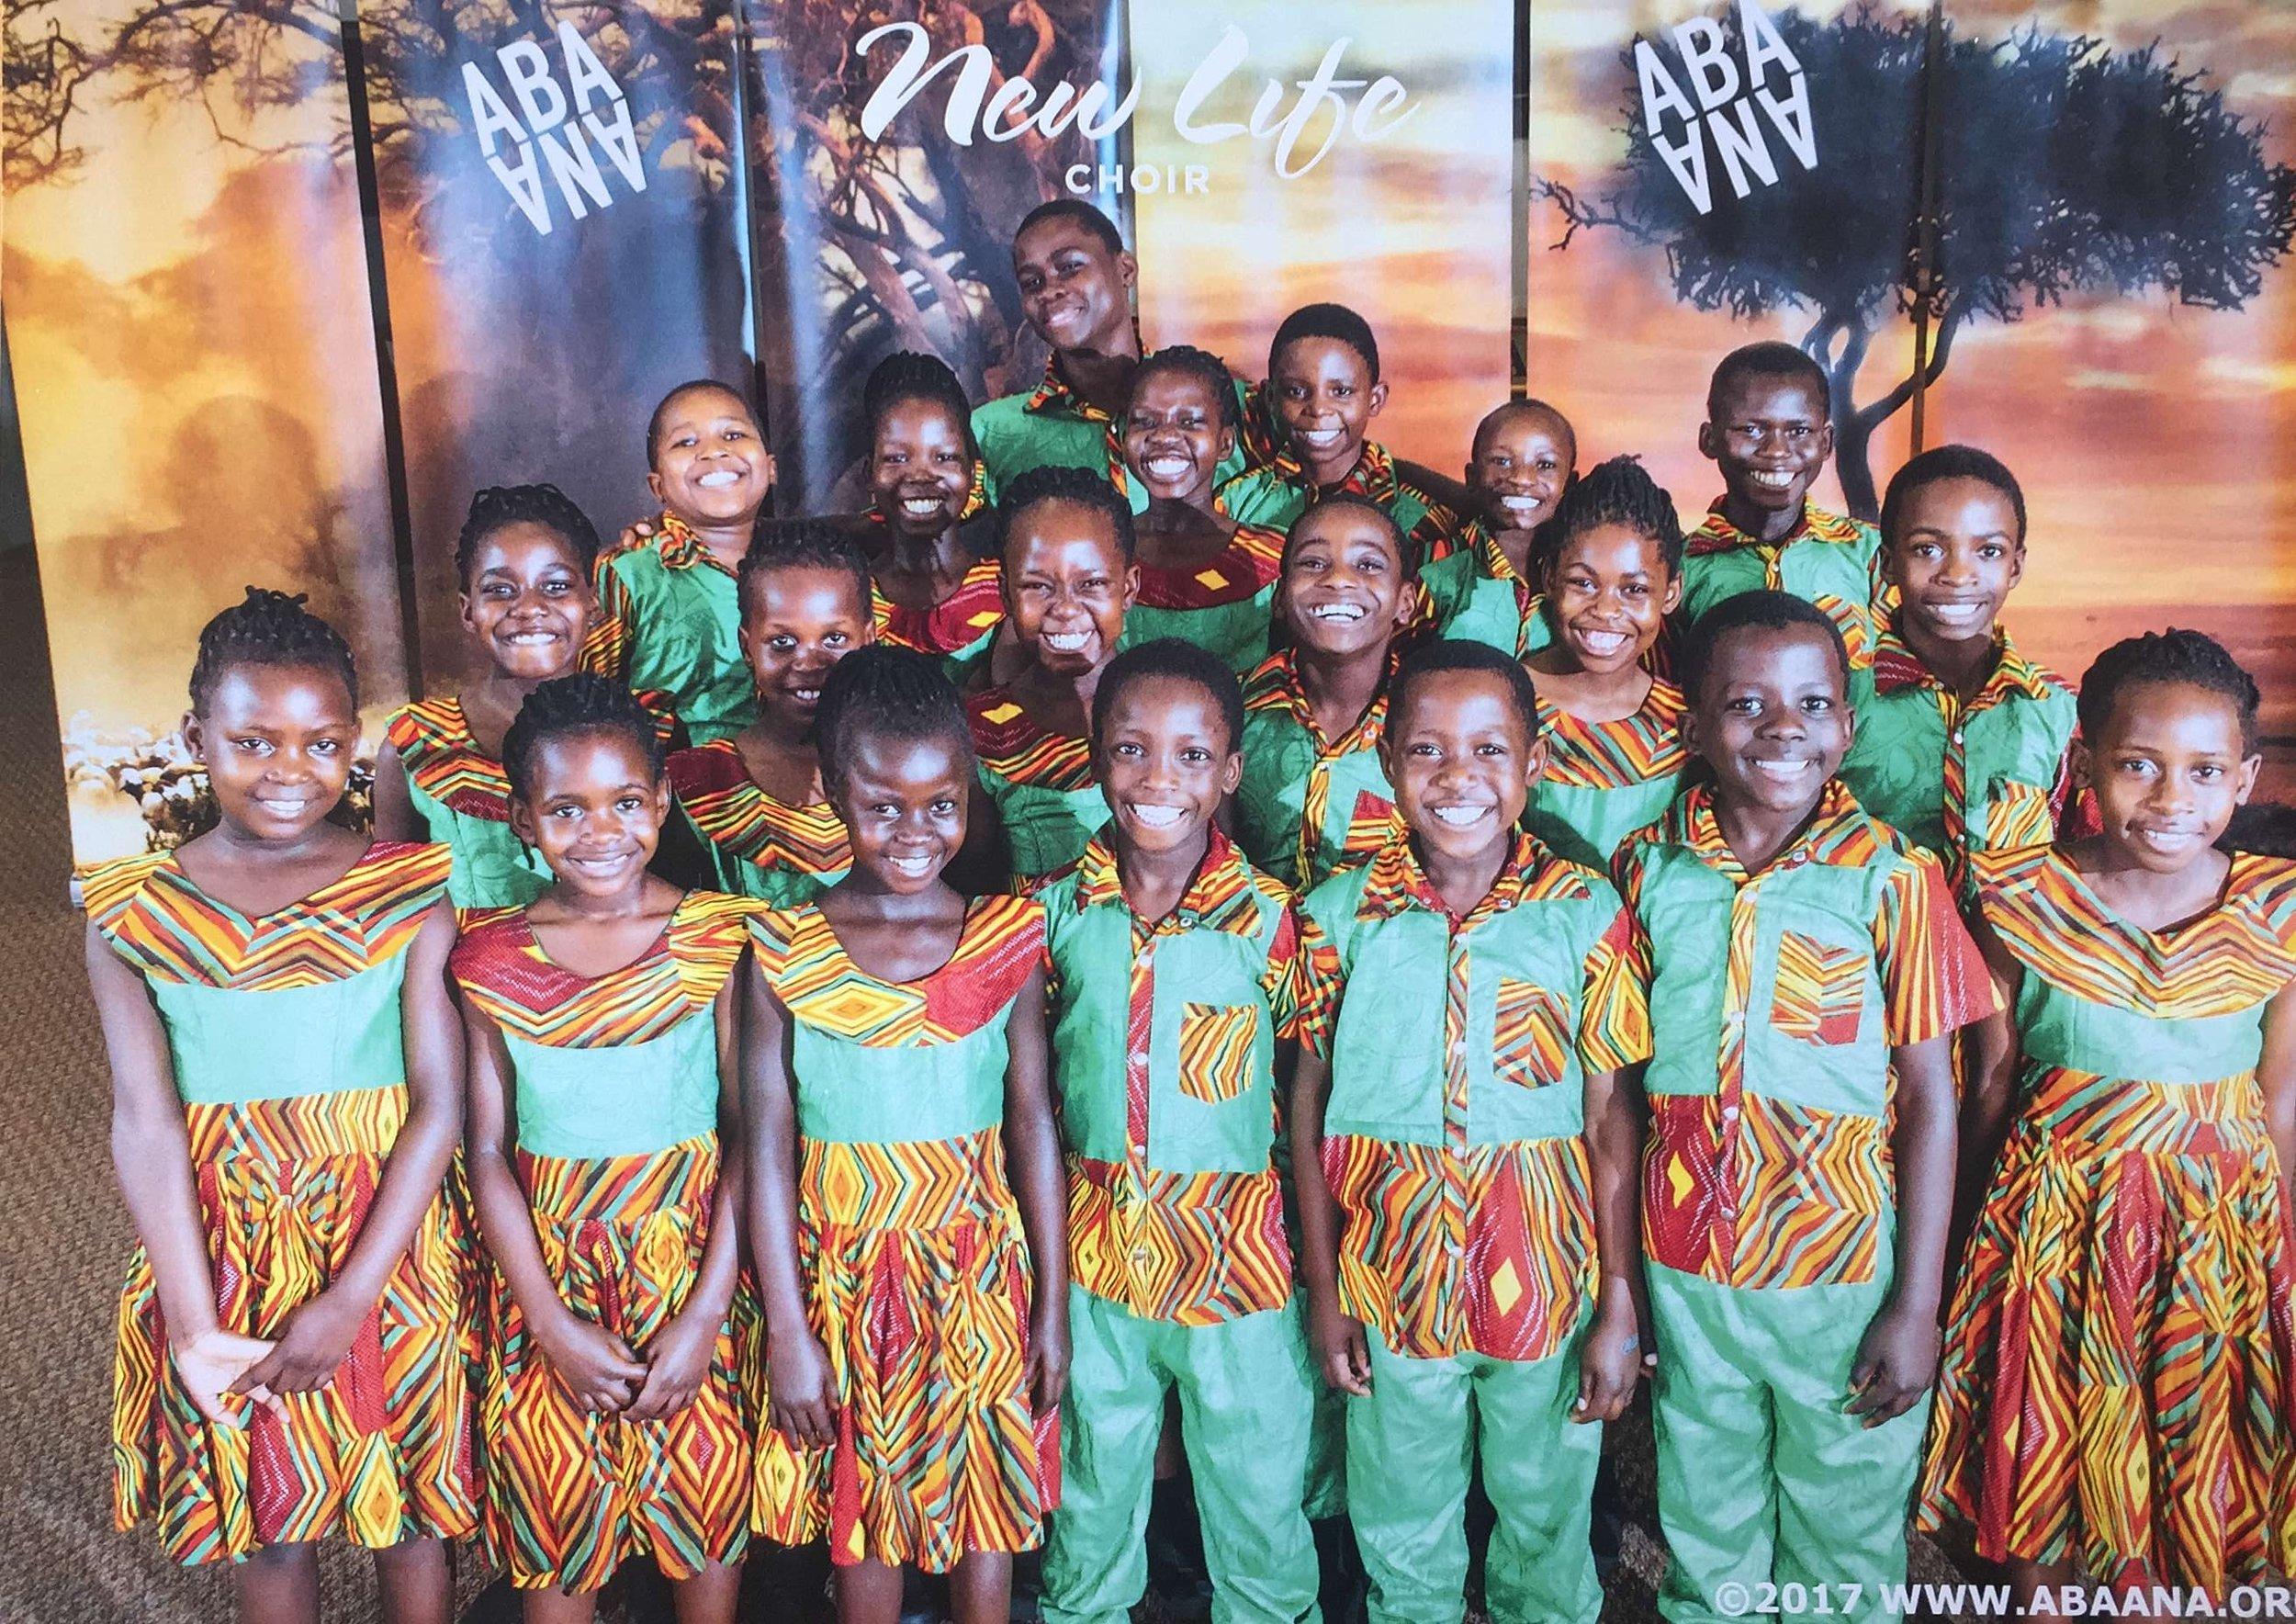 Abaana New Life Choir Drung Ballyhaise Larah Lavey Killoughter